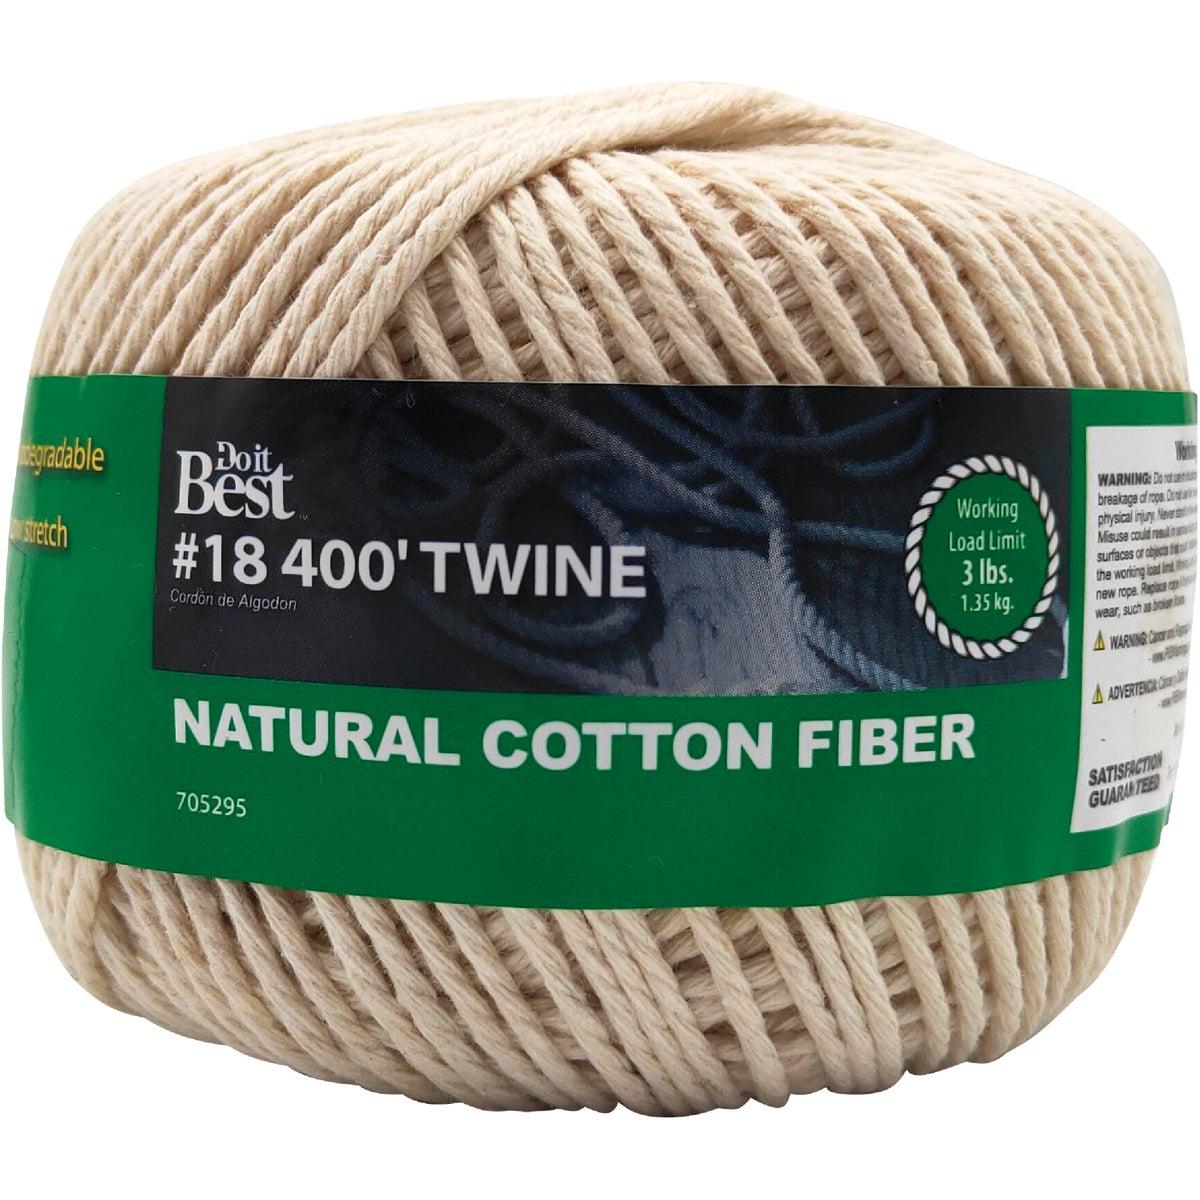 #18 400' COTTON TWINE